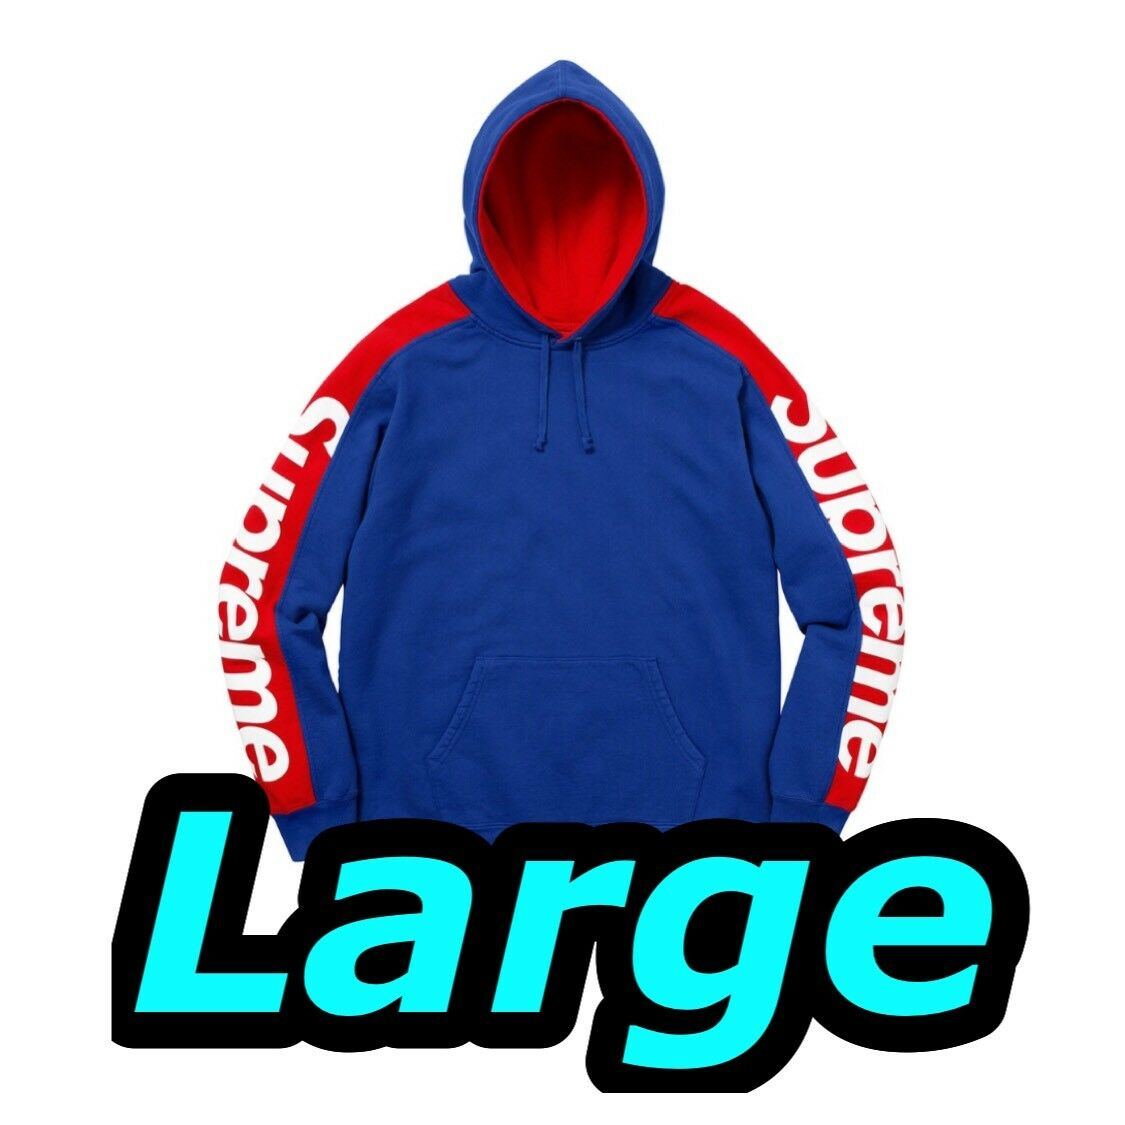 Supreme sideline hooded Large  sweatshirt Royal bluee Red Box Logo CDG split